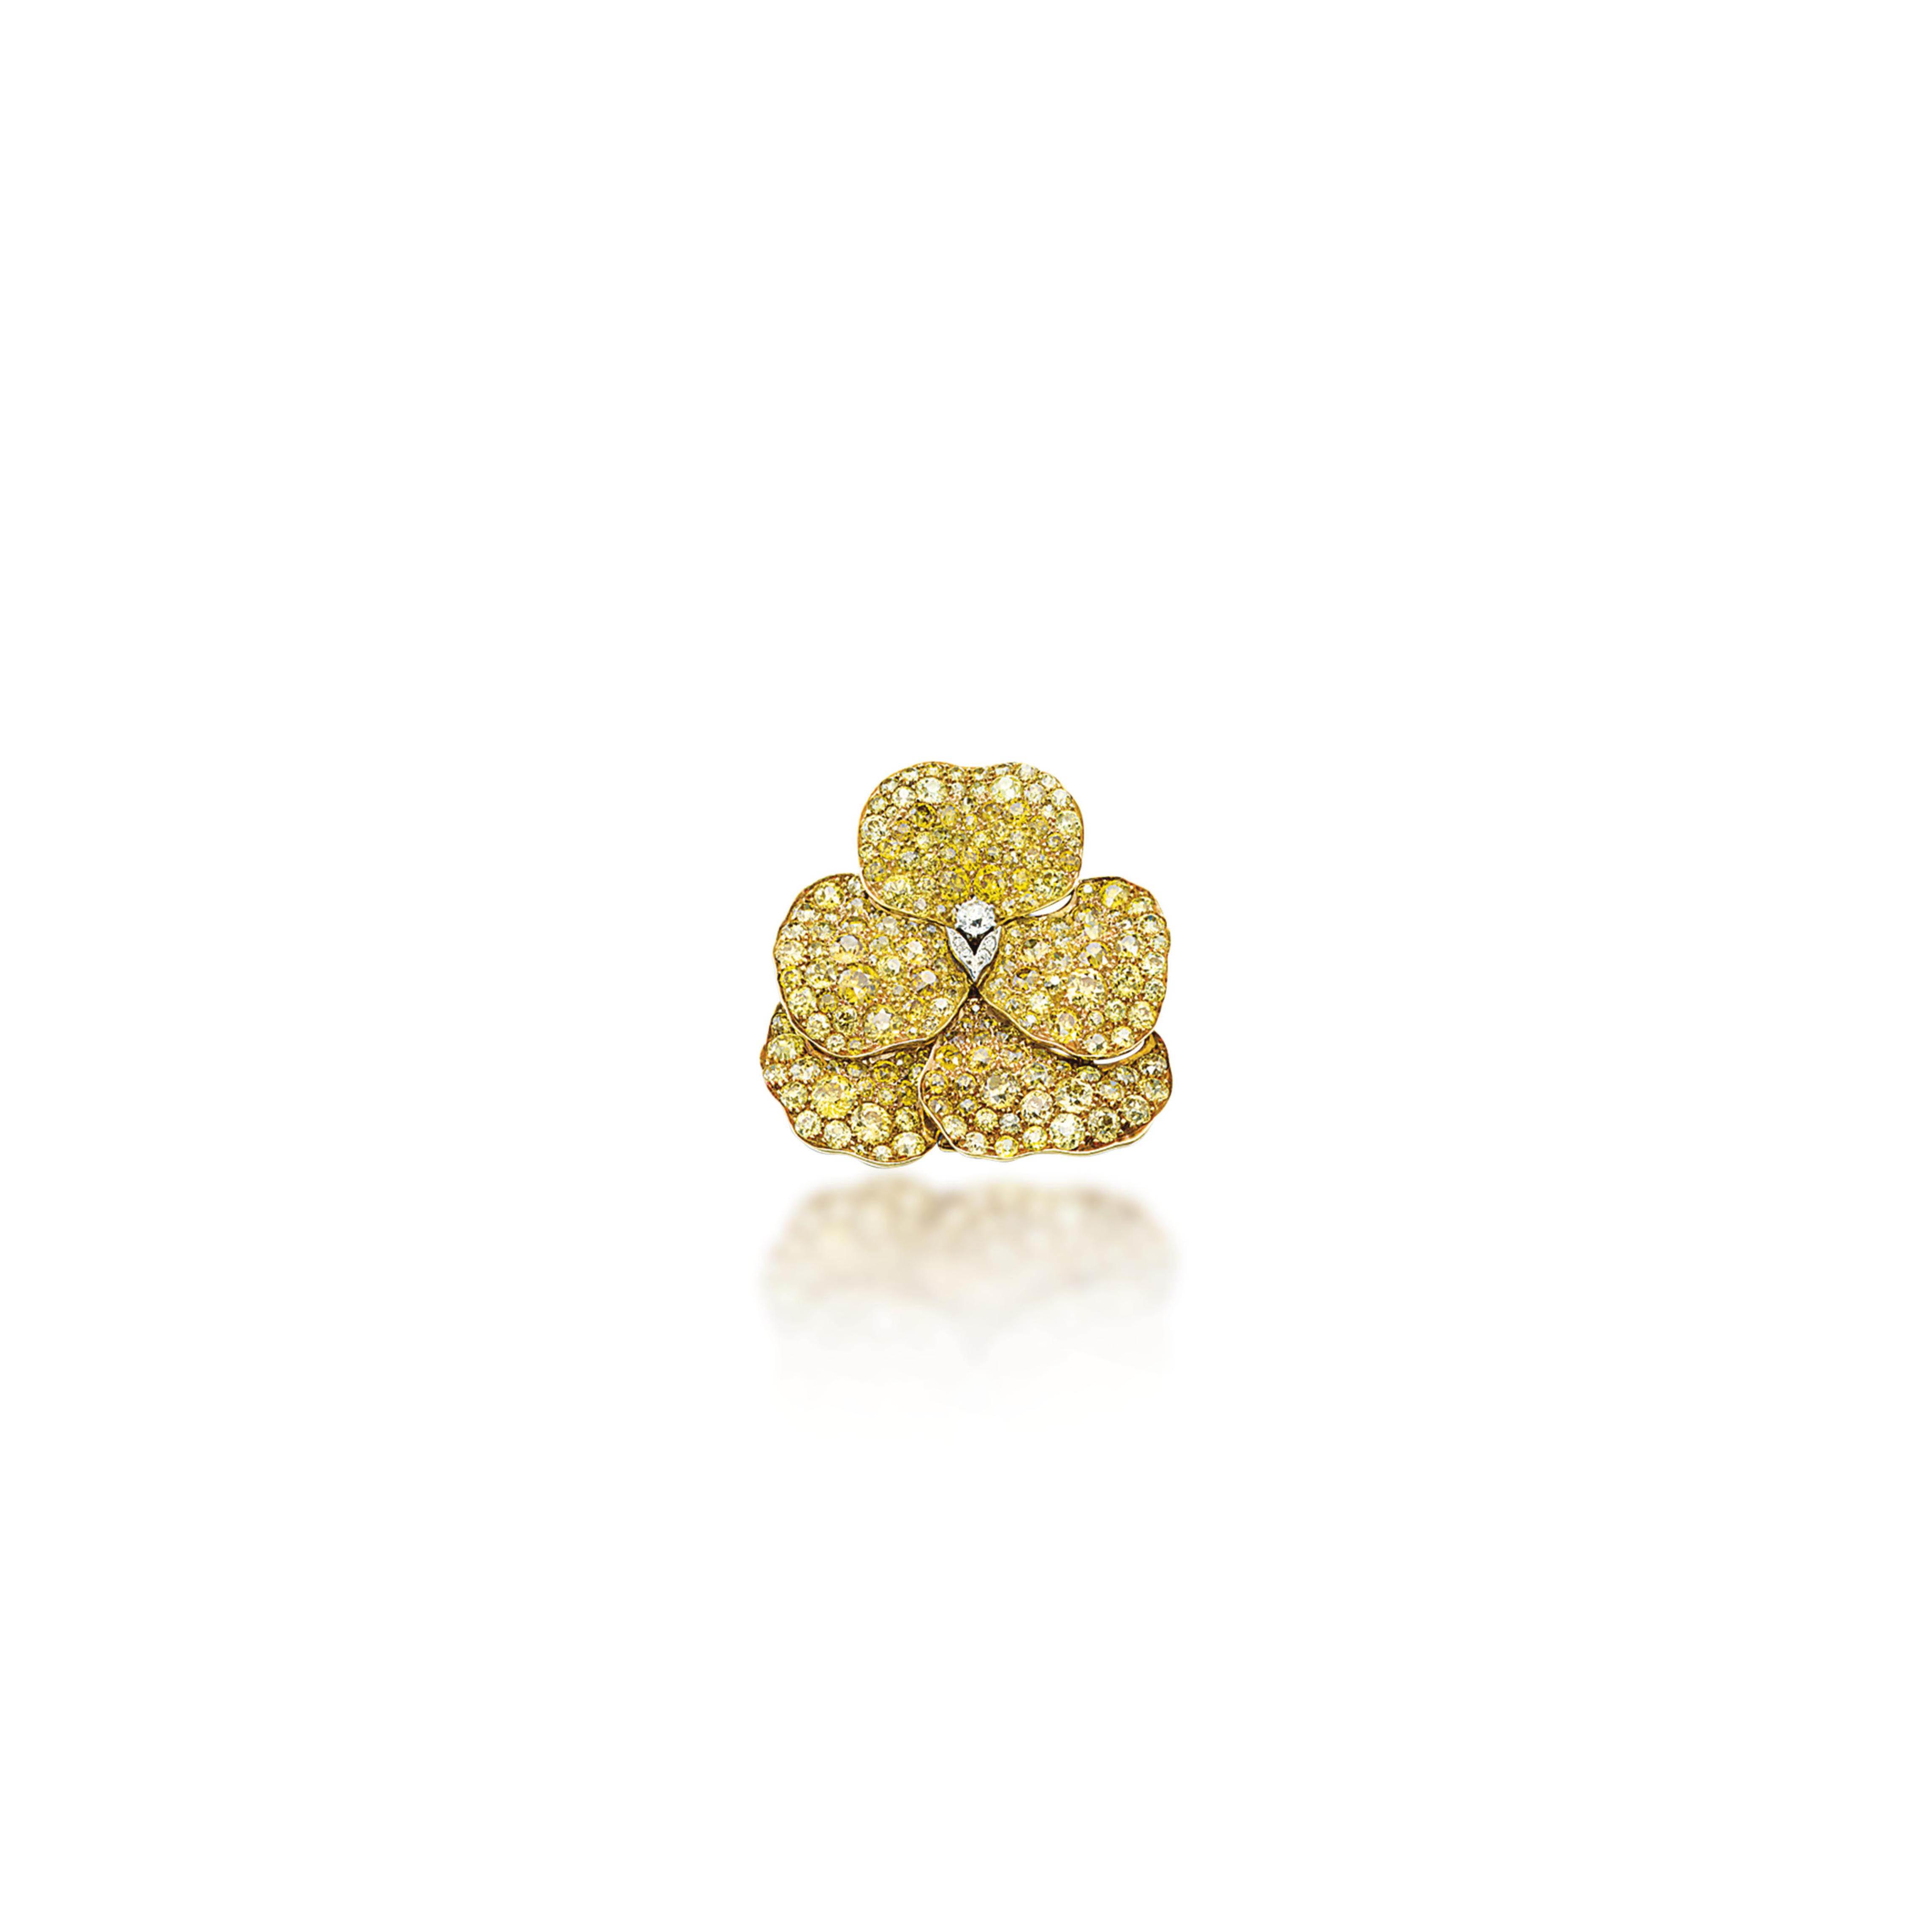 A COLOURED DIAMOND FLOWER BROOCH, BY MARCUS & CO.